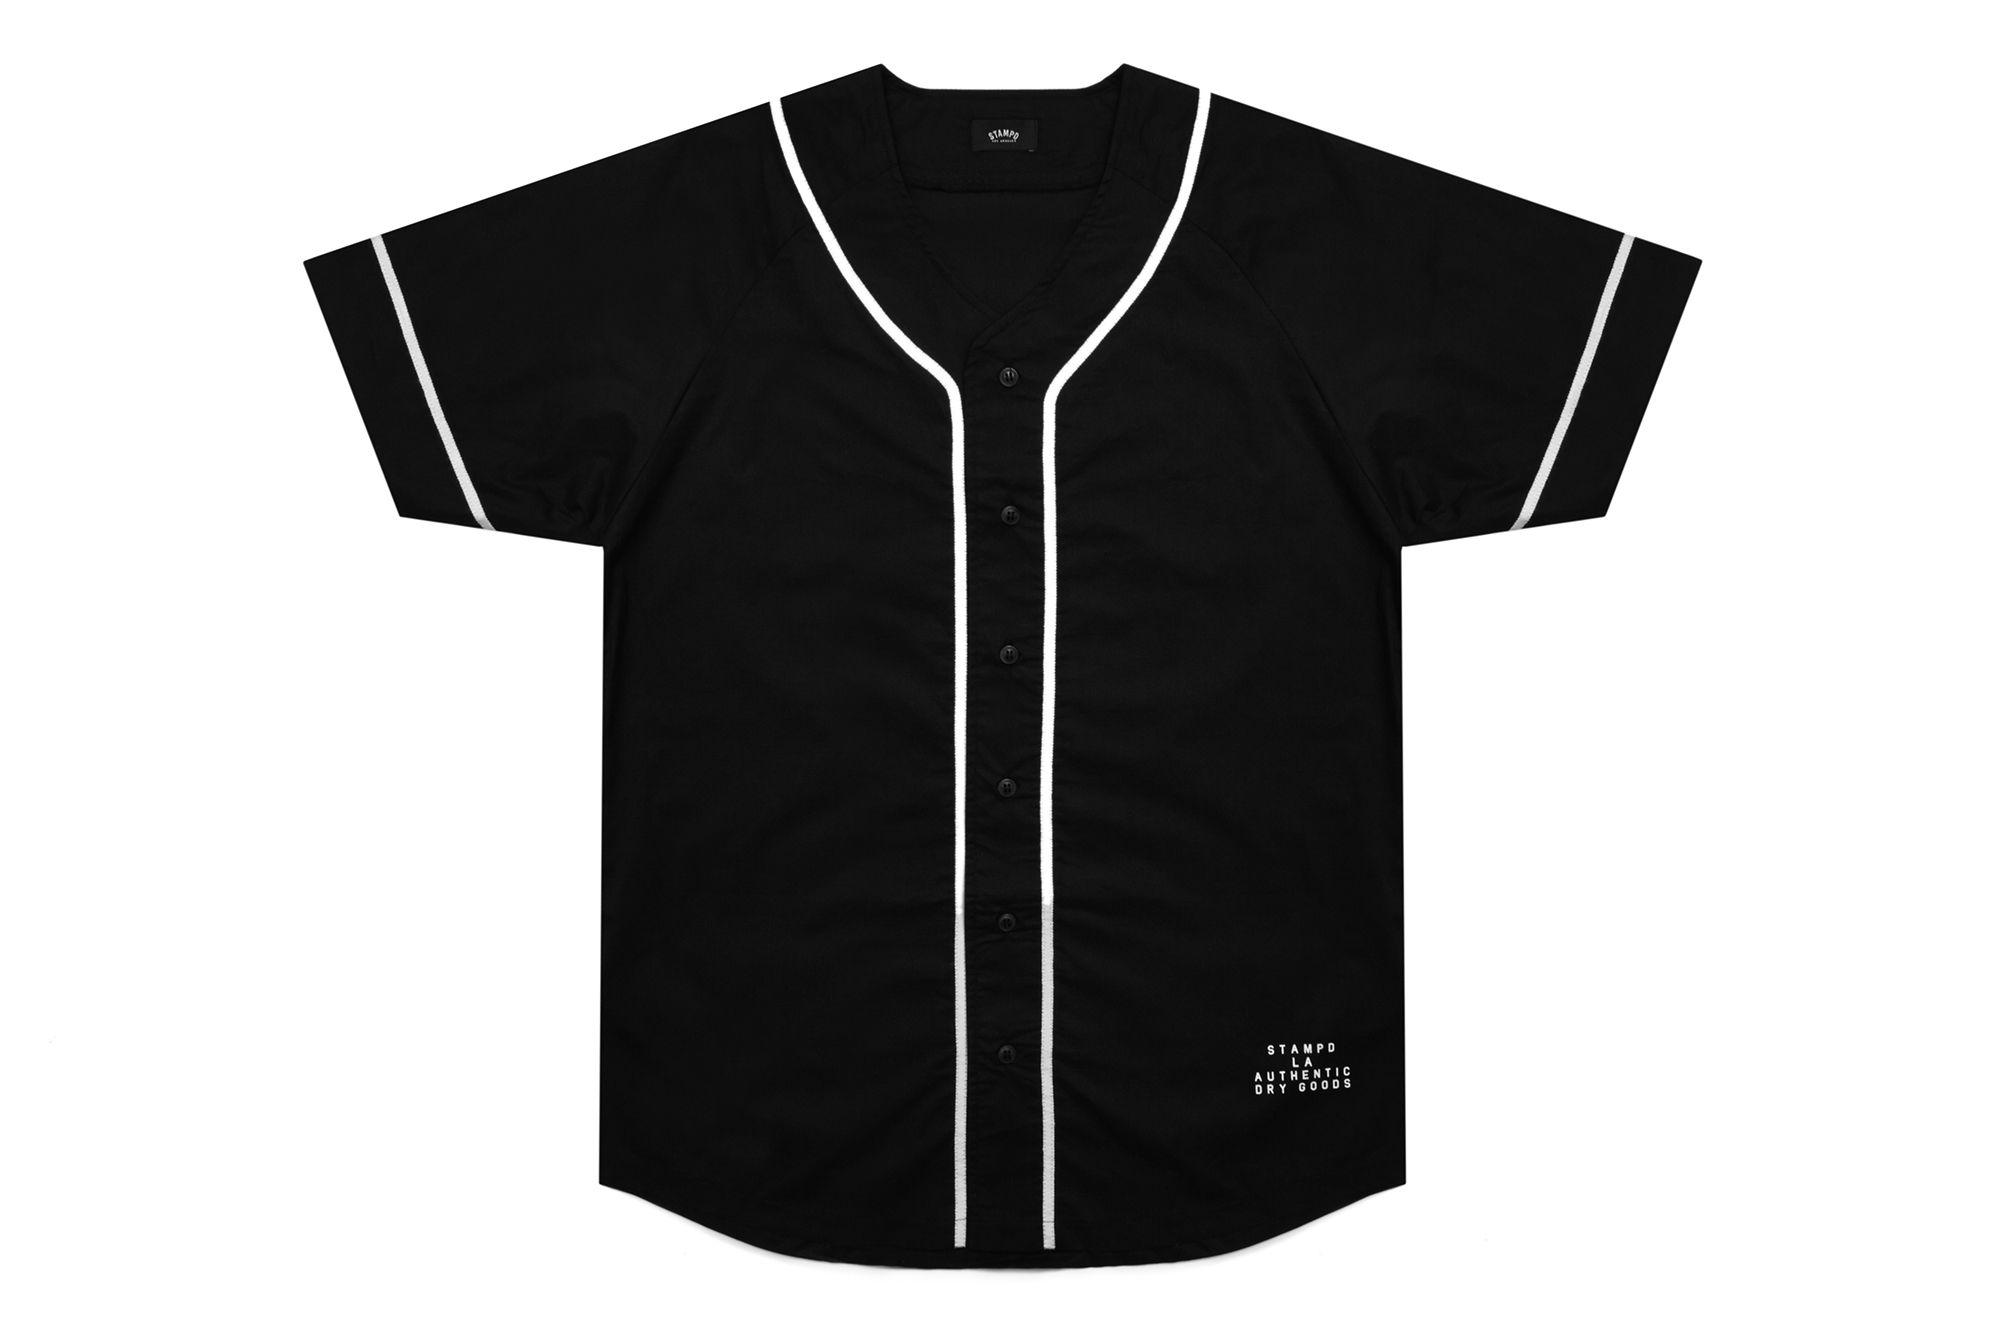 baseball jersey black and white